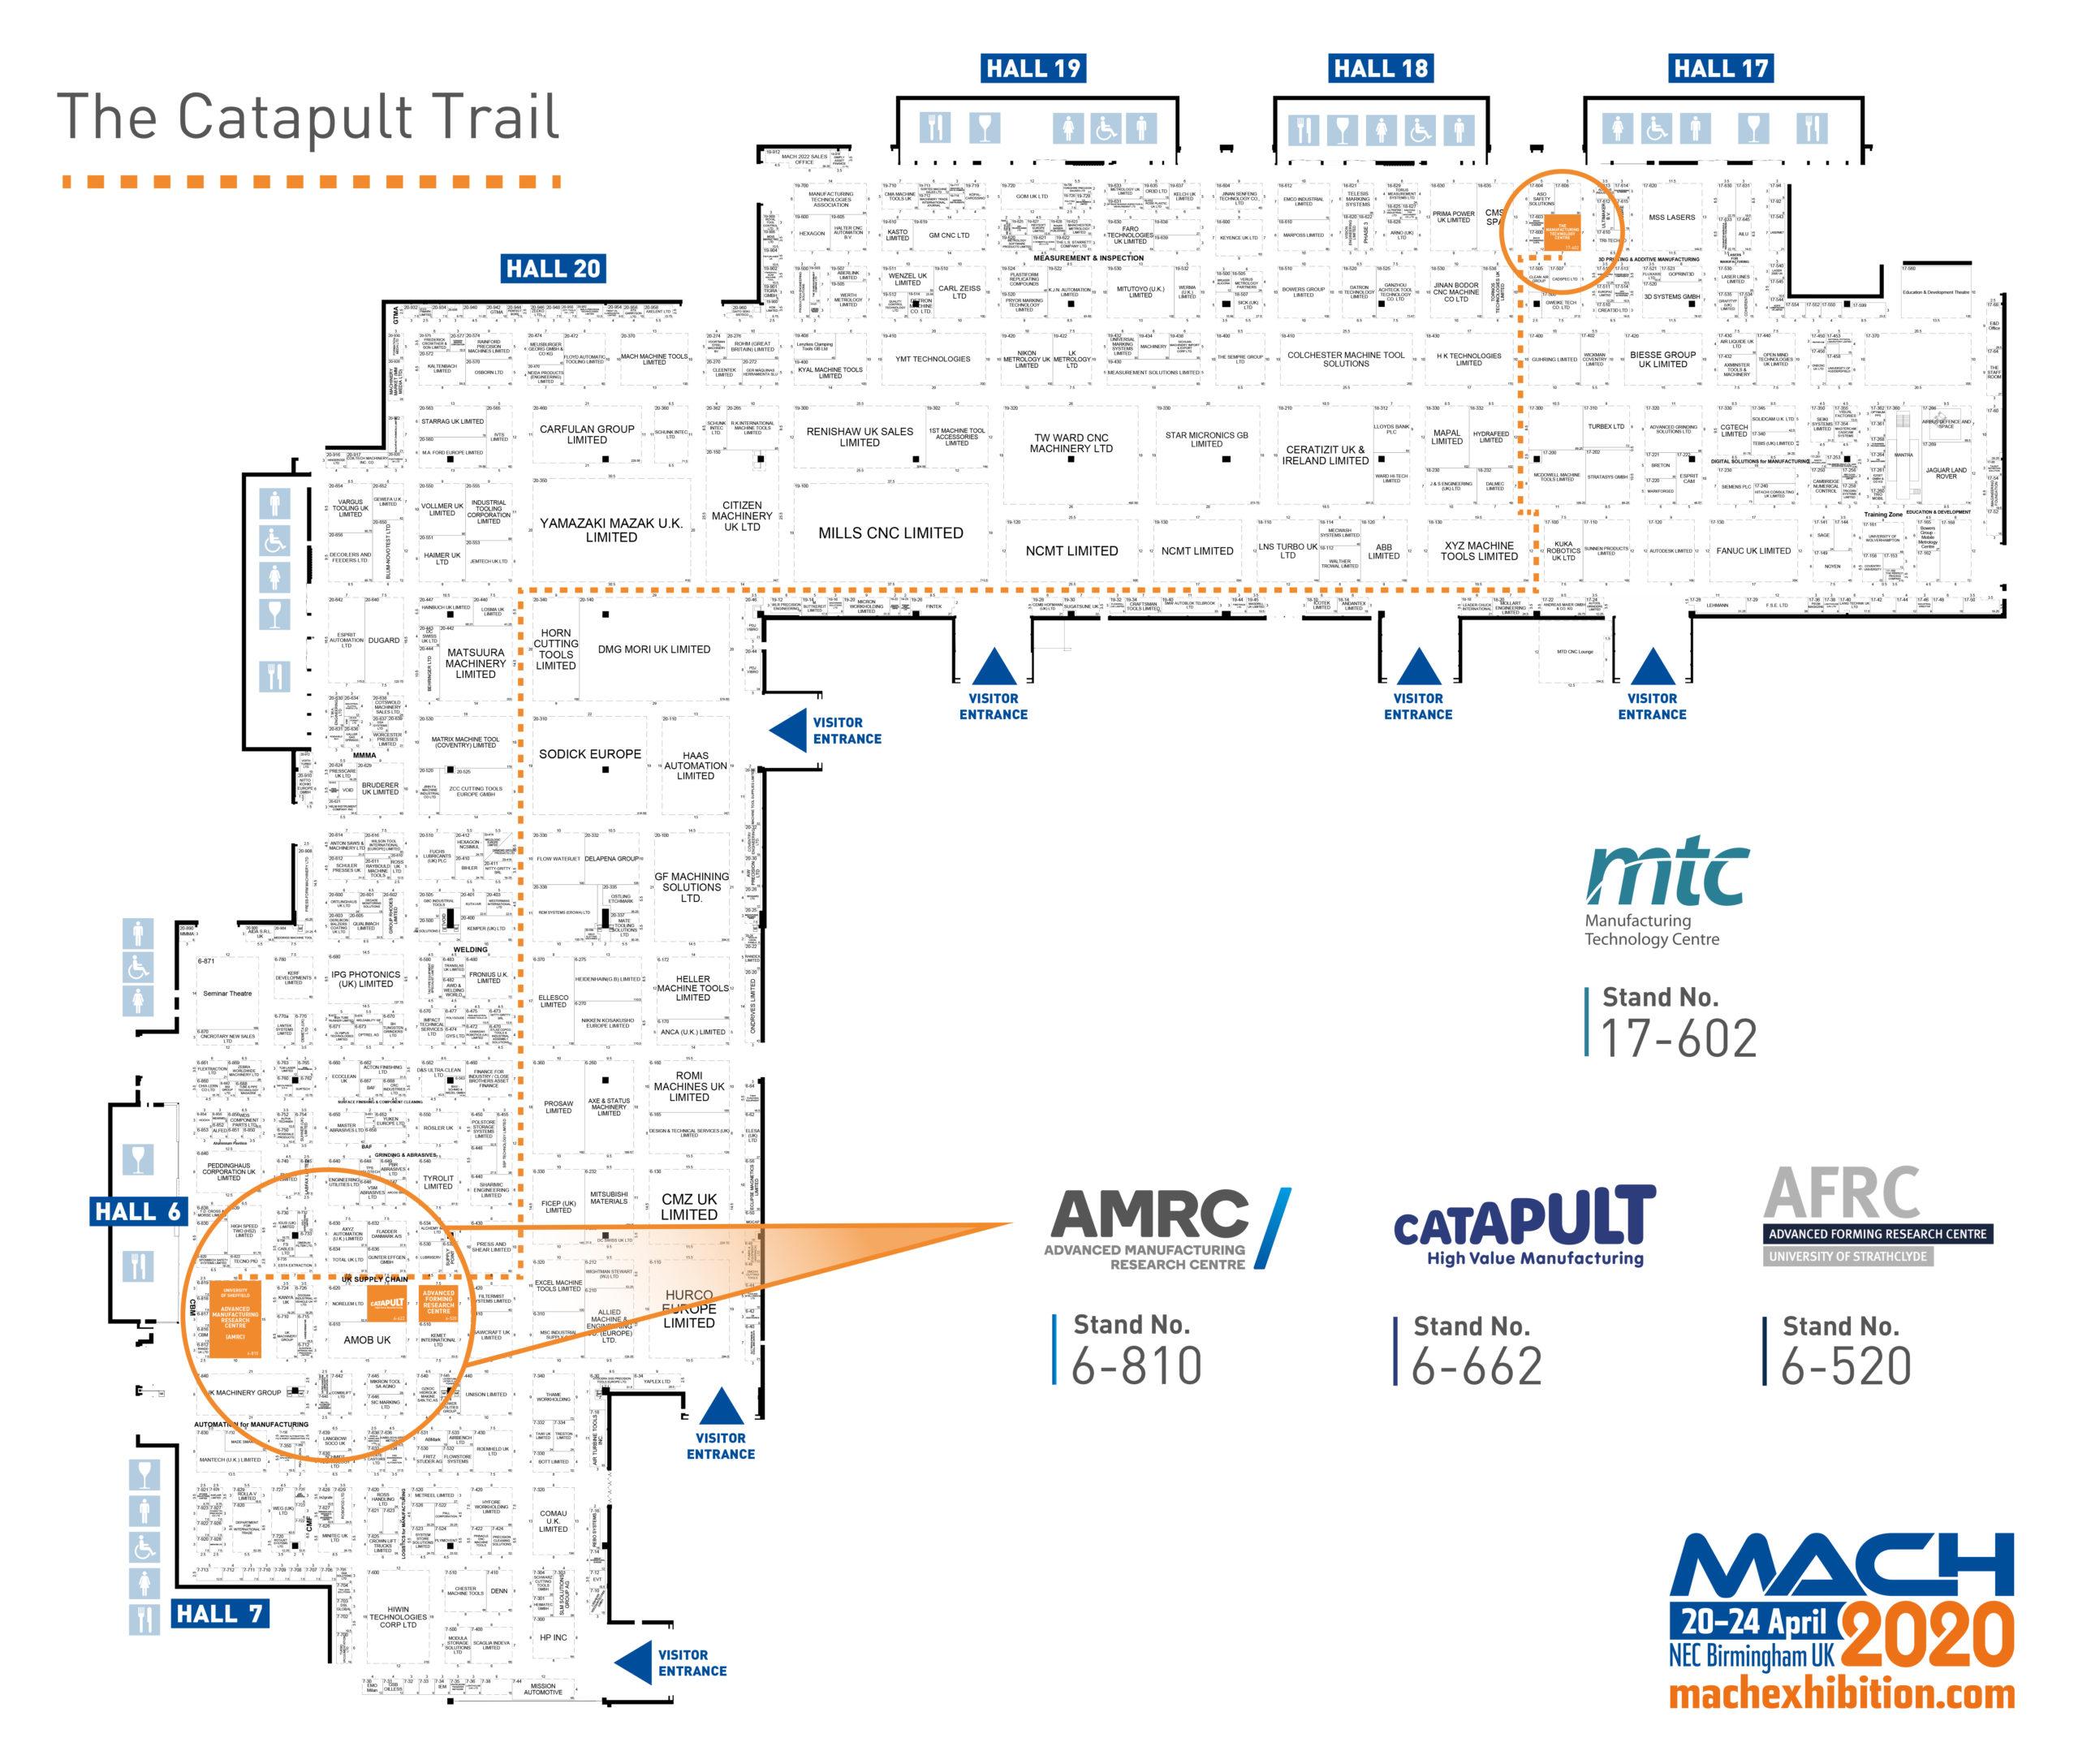 https://cdn.mtdcnc.global/cnc/wp-content/uploads/2020/05/07144417/CATAPULT-TRAIL-MACH-2020-scaled.jpg